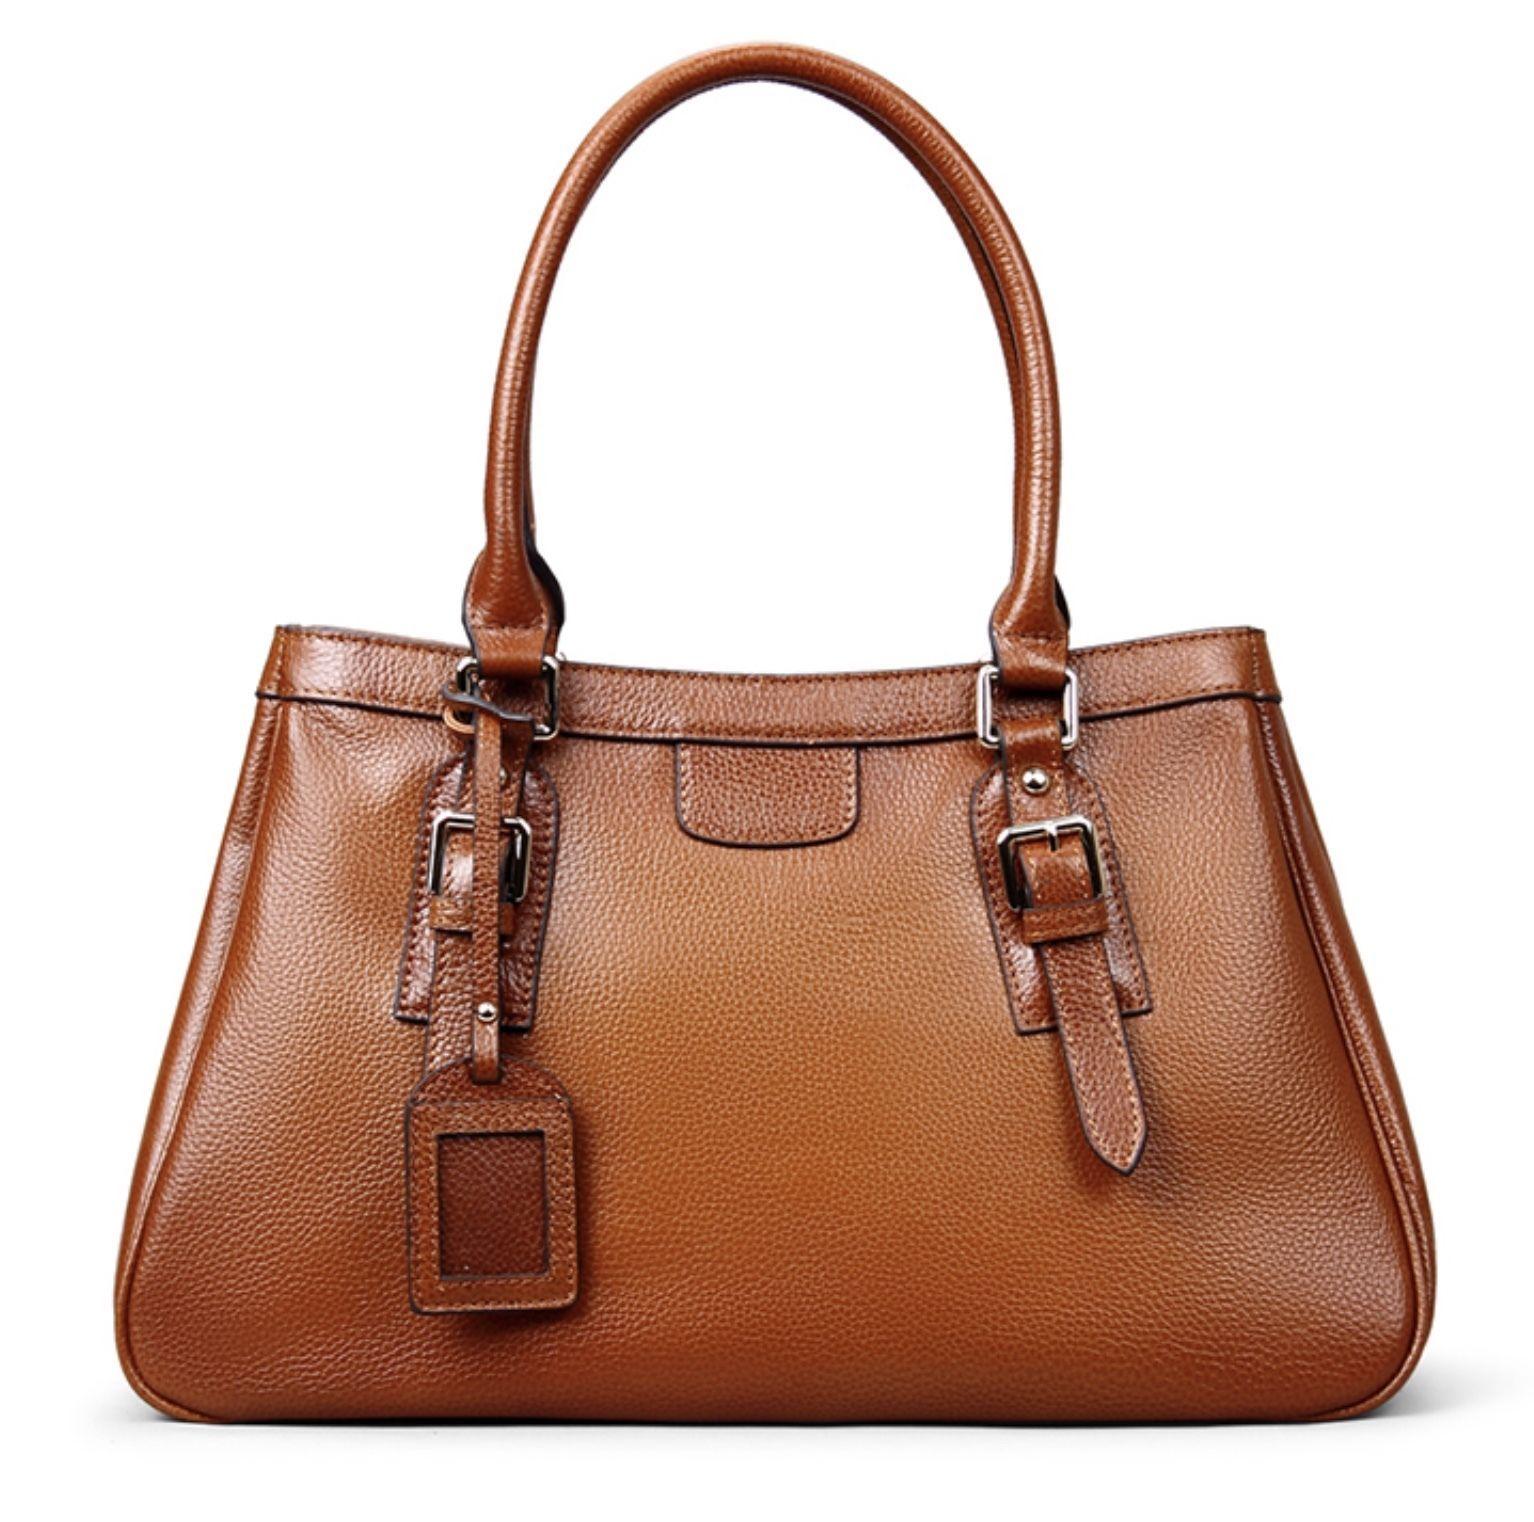 New Pebbled Italian Leather Brown Satchel Handbag Shoulder Bag 9834